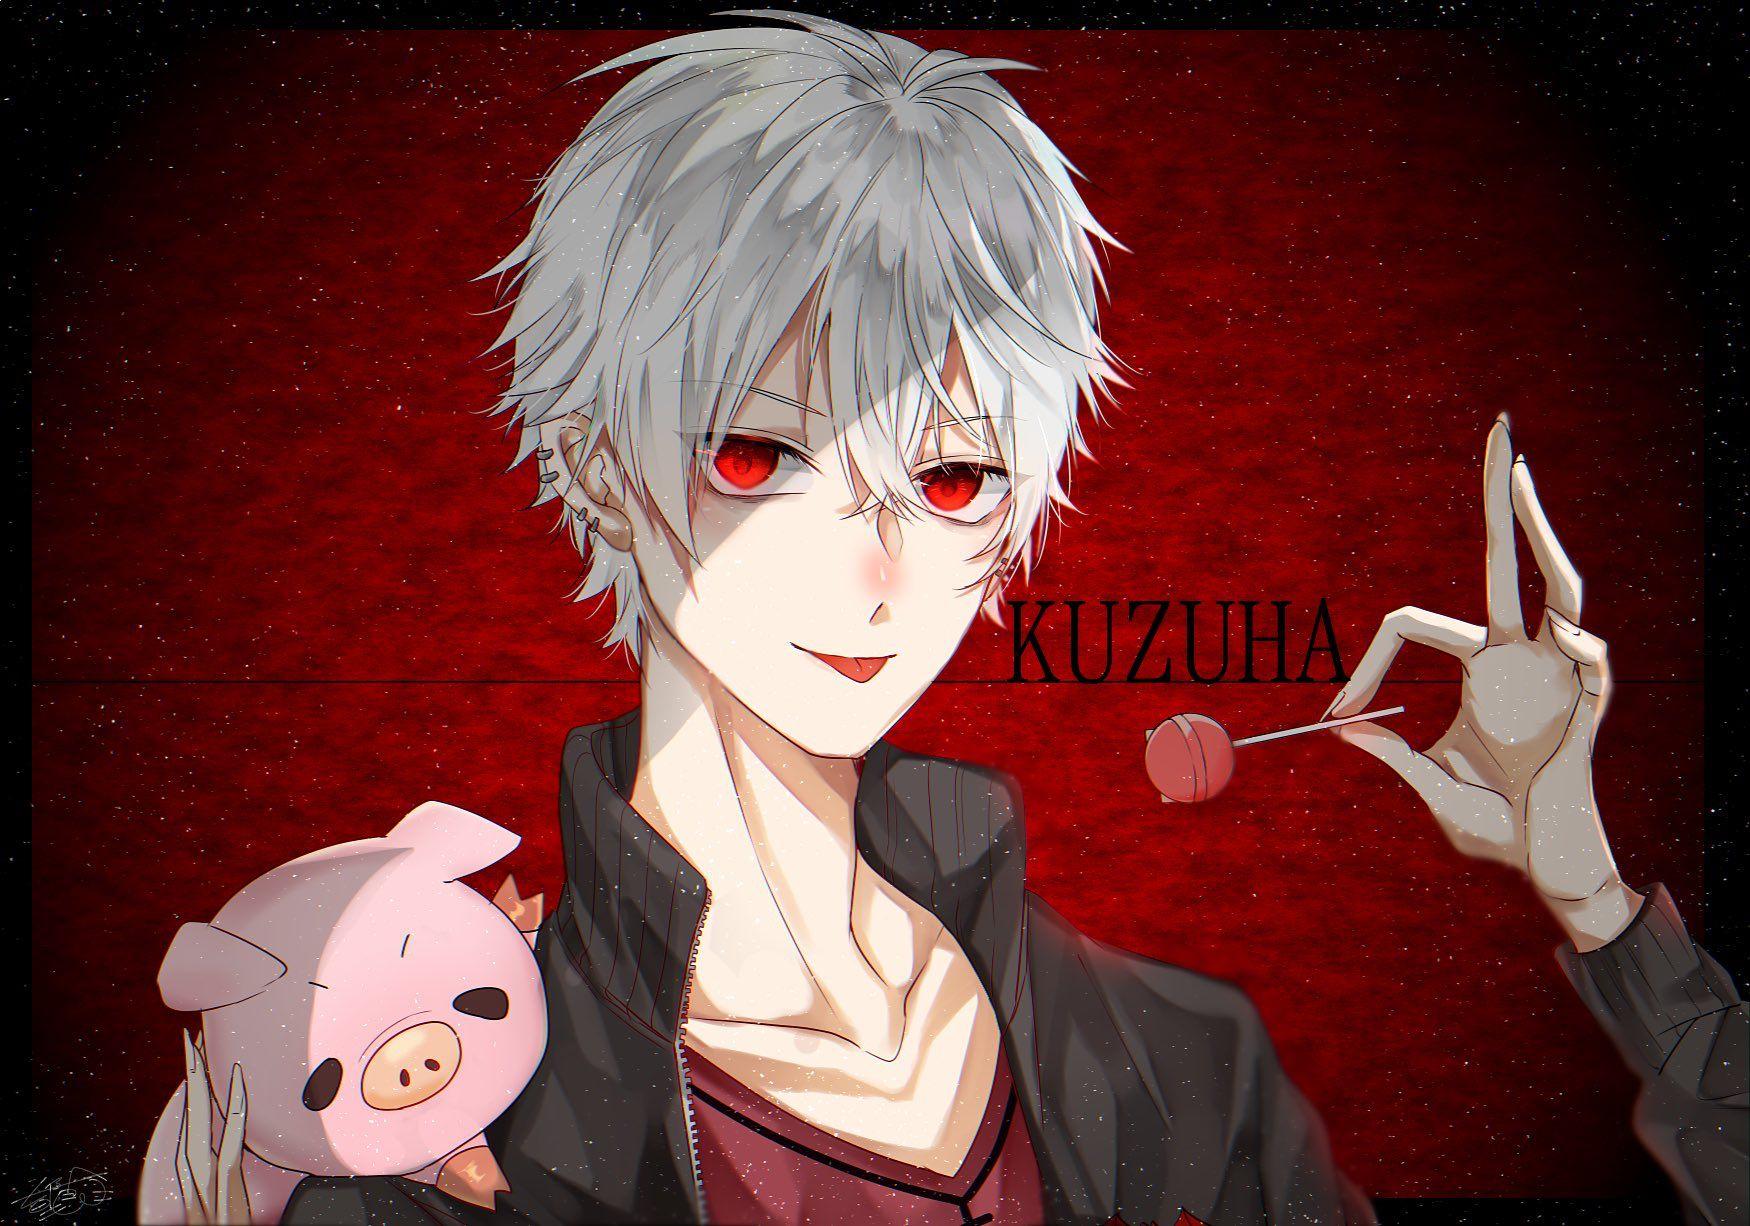 Pin By Iilllili Il Lllilii On Vtuber Anime Anime Guys Anime Boy